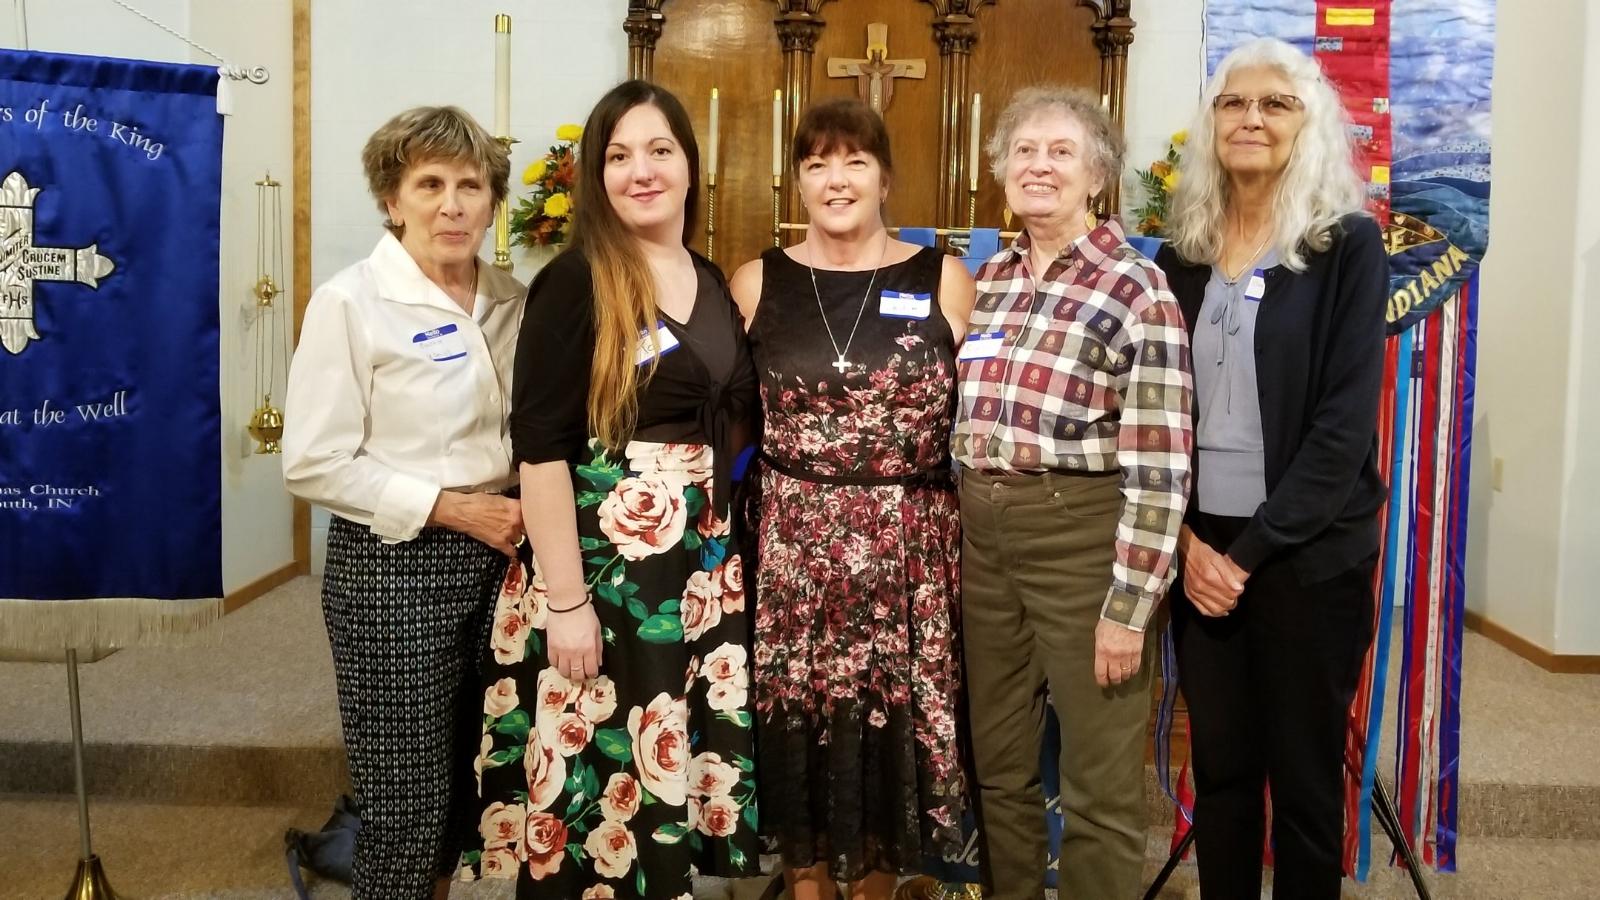 Daughters of the King Executive Board L-R: Cynthia Guzzo (Treas.) Toy Stick (Coresponding Sec.), Julie Chandler (Pres.), Elaine Fazzaro (VP), Barb Schramm (Sec.)